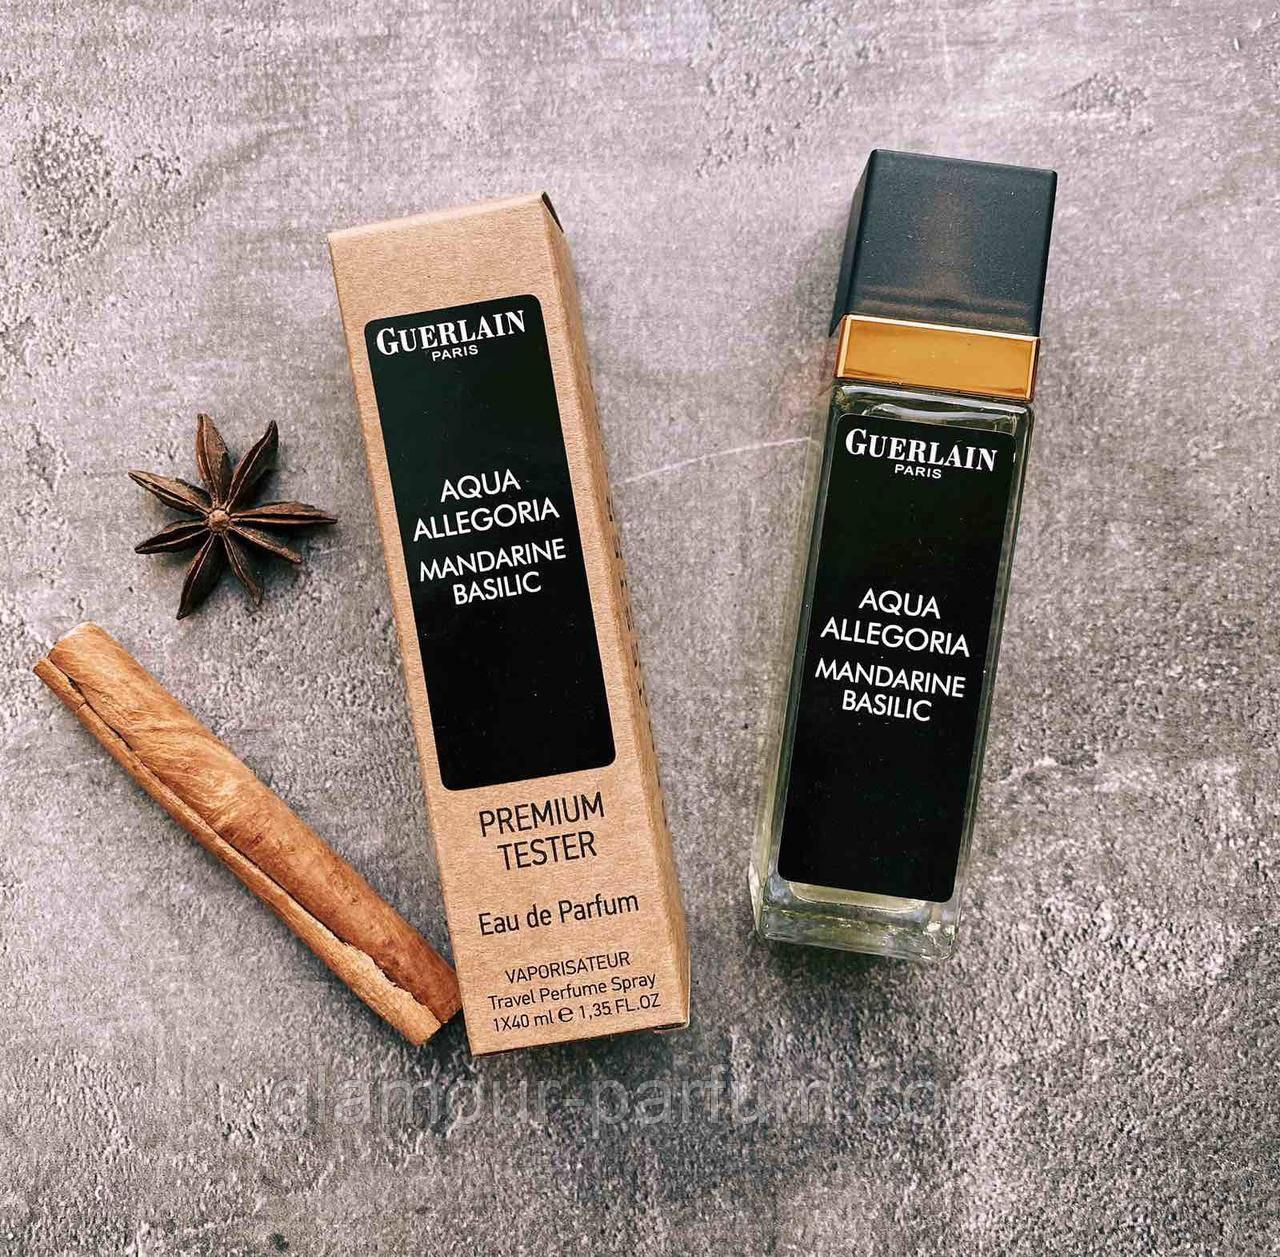 TESTER женский мини-парфюм Guerlain Aqua Allegoria Mandarine Basilic 40мл реплика ОПТ